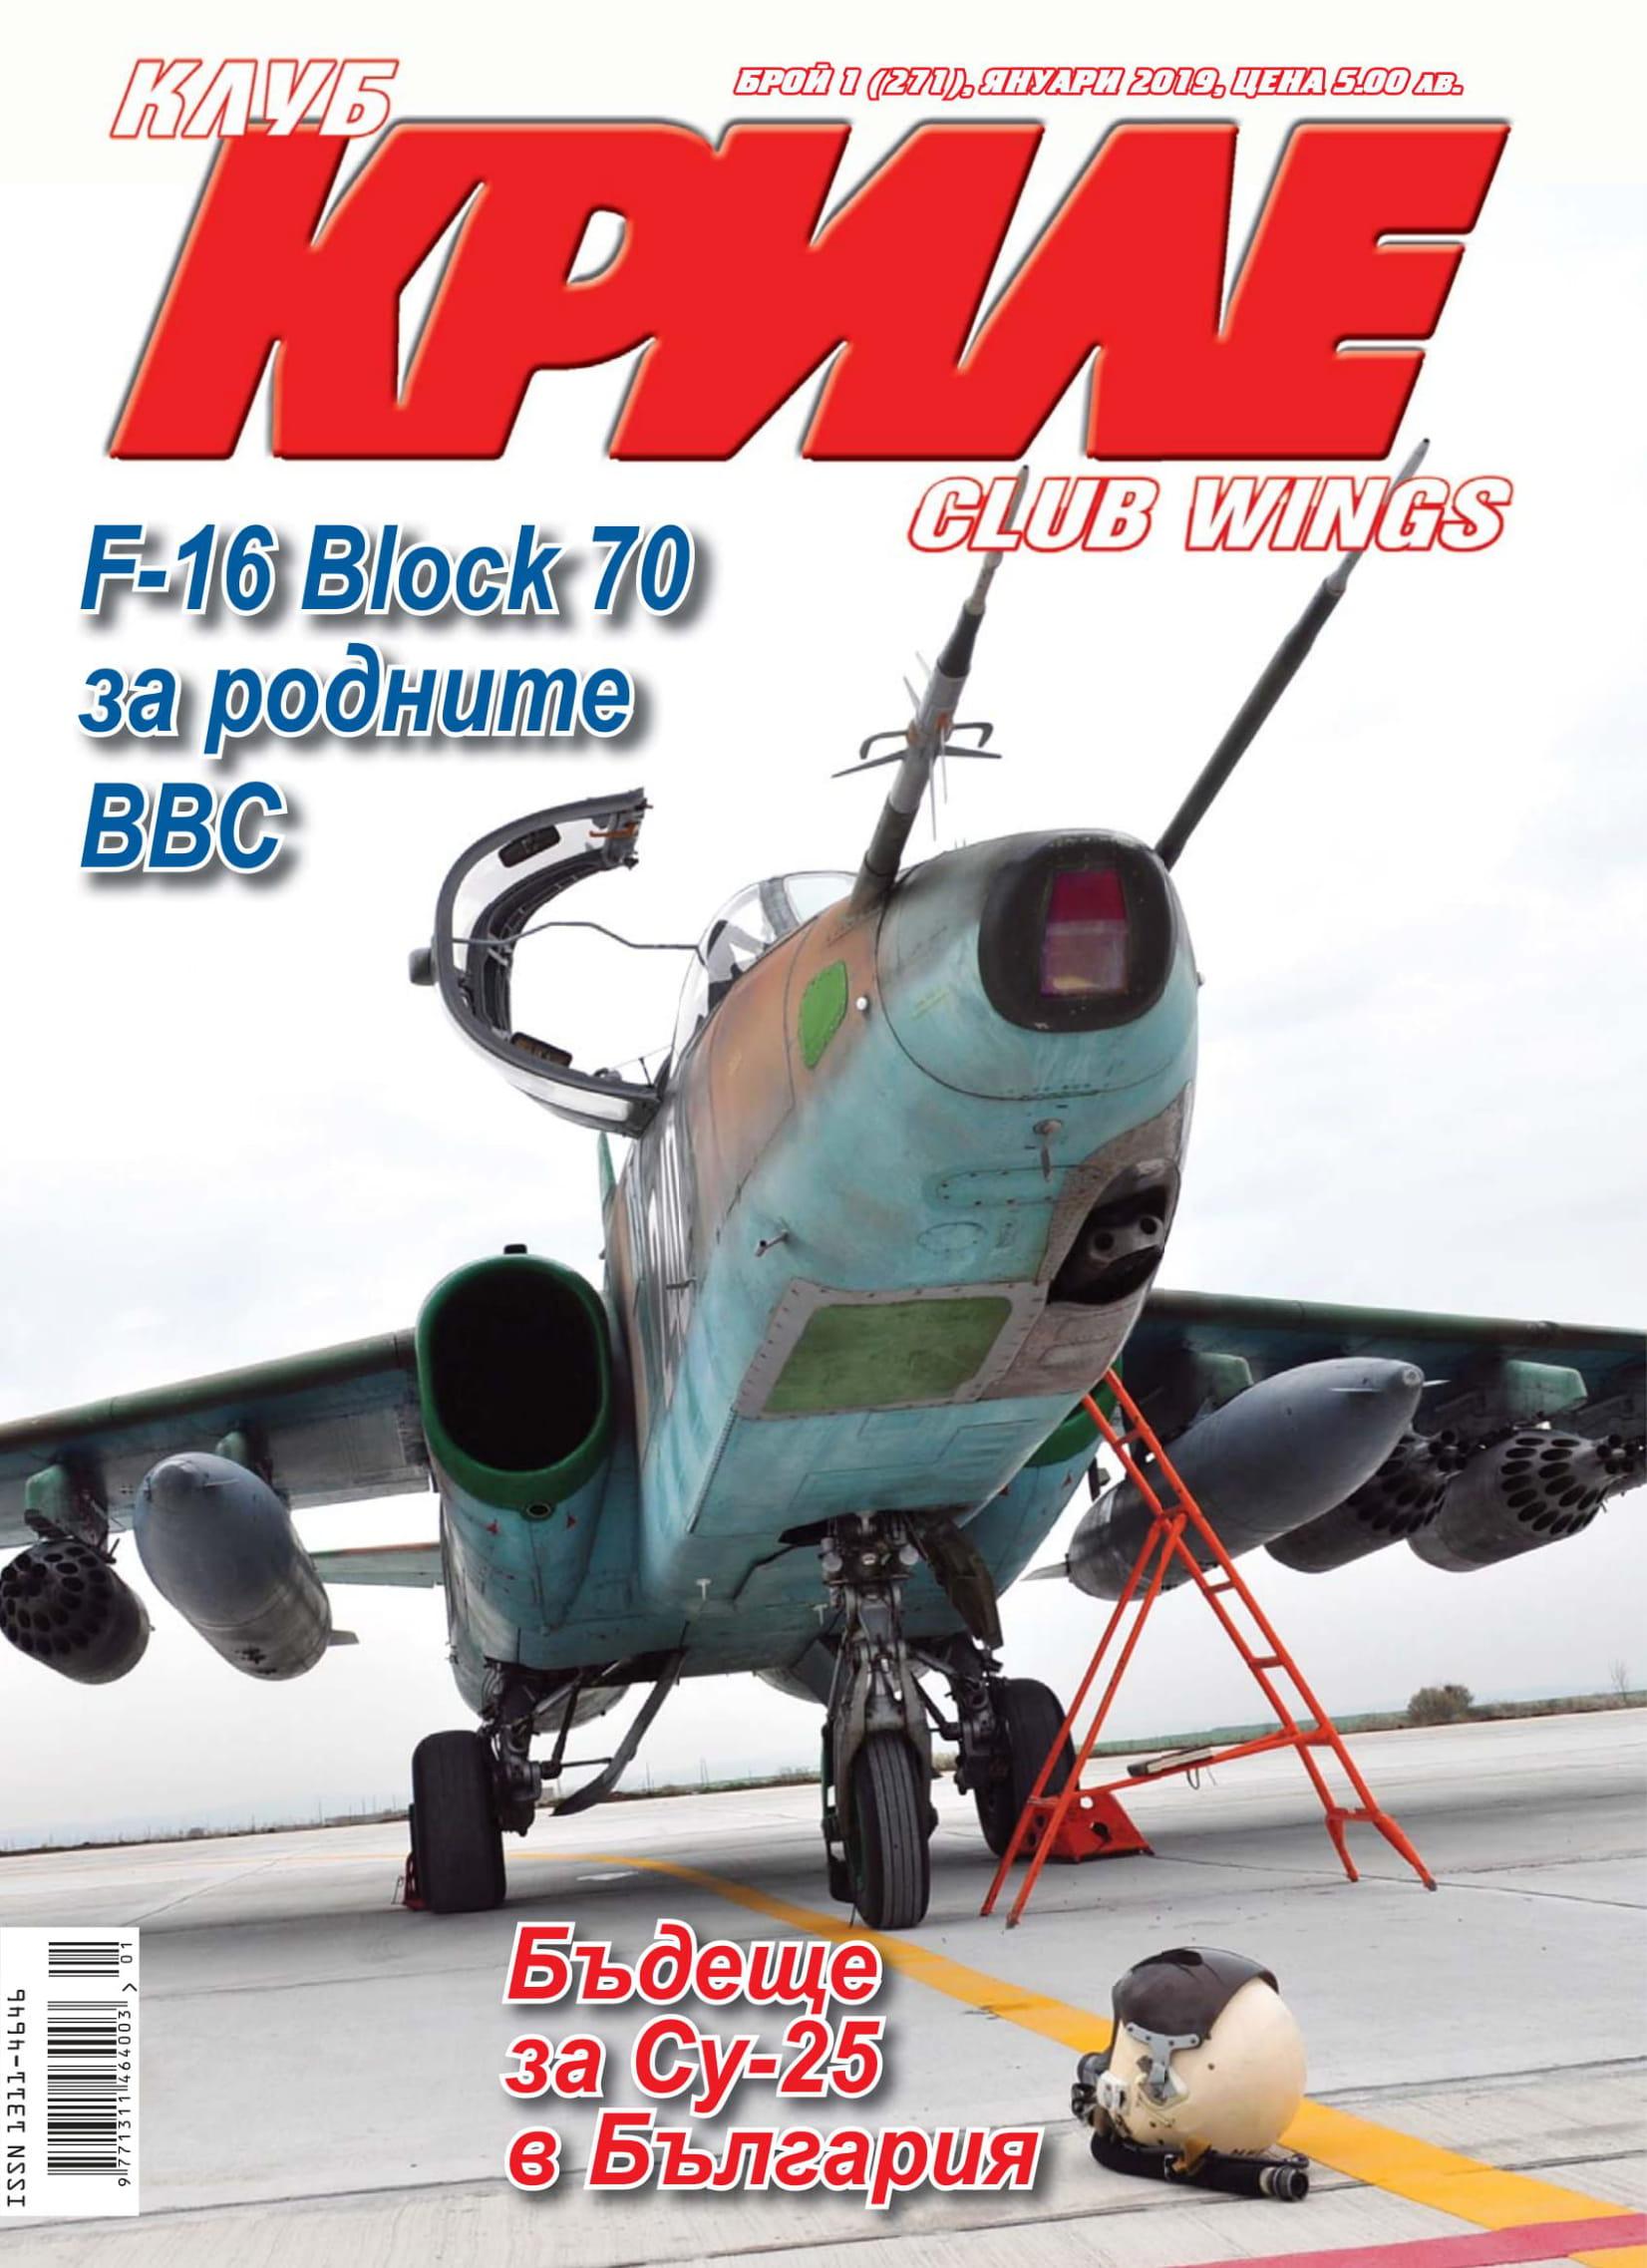 Club Wings (Bulgaria)_Lebanese Air Force (part 1)-1